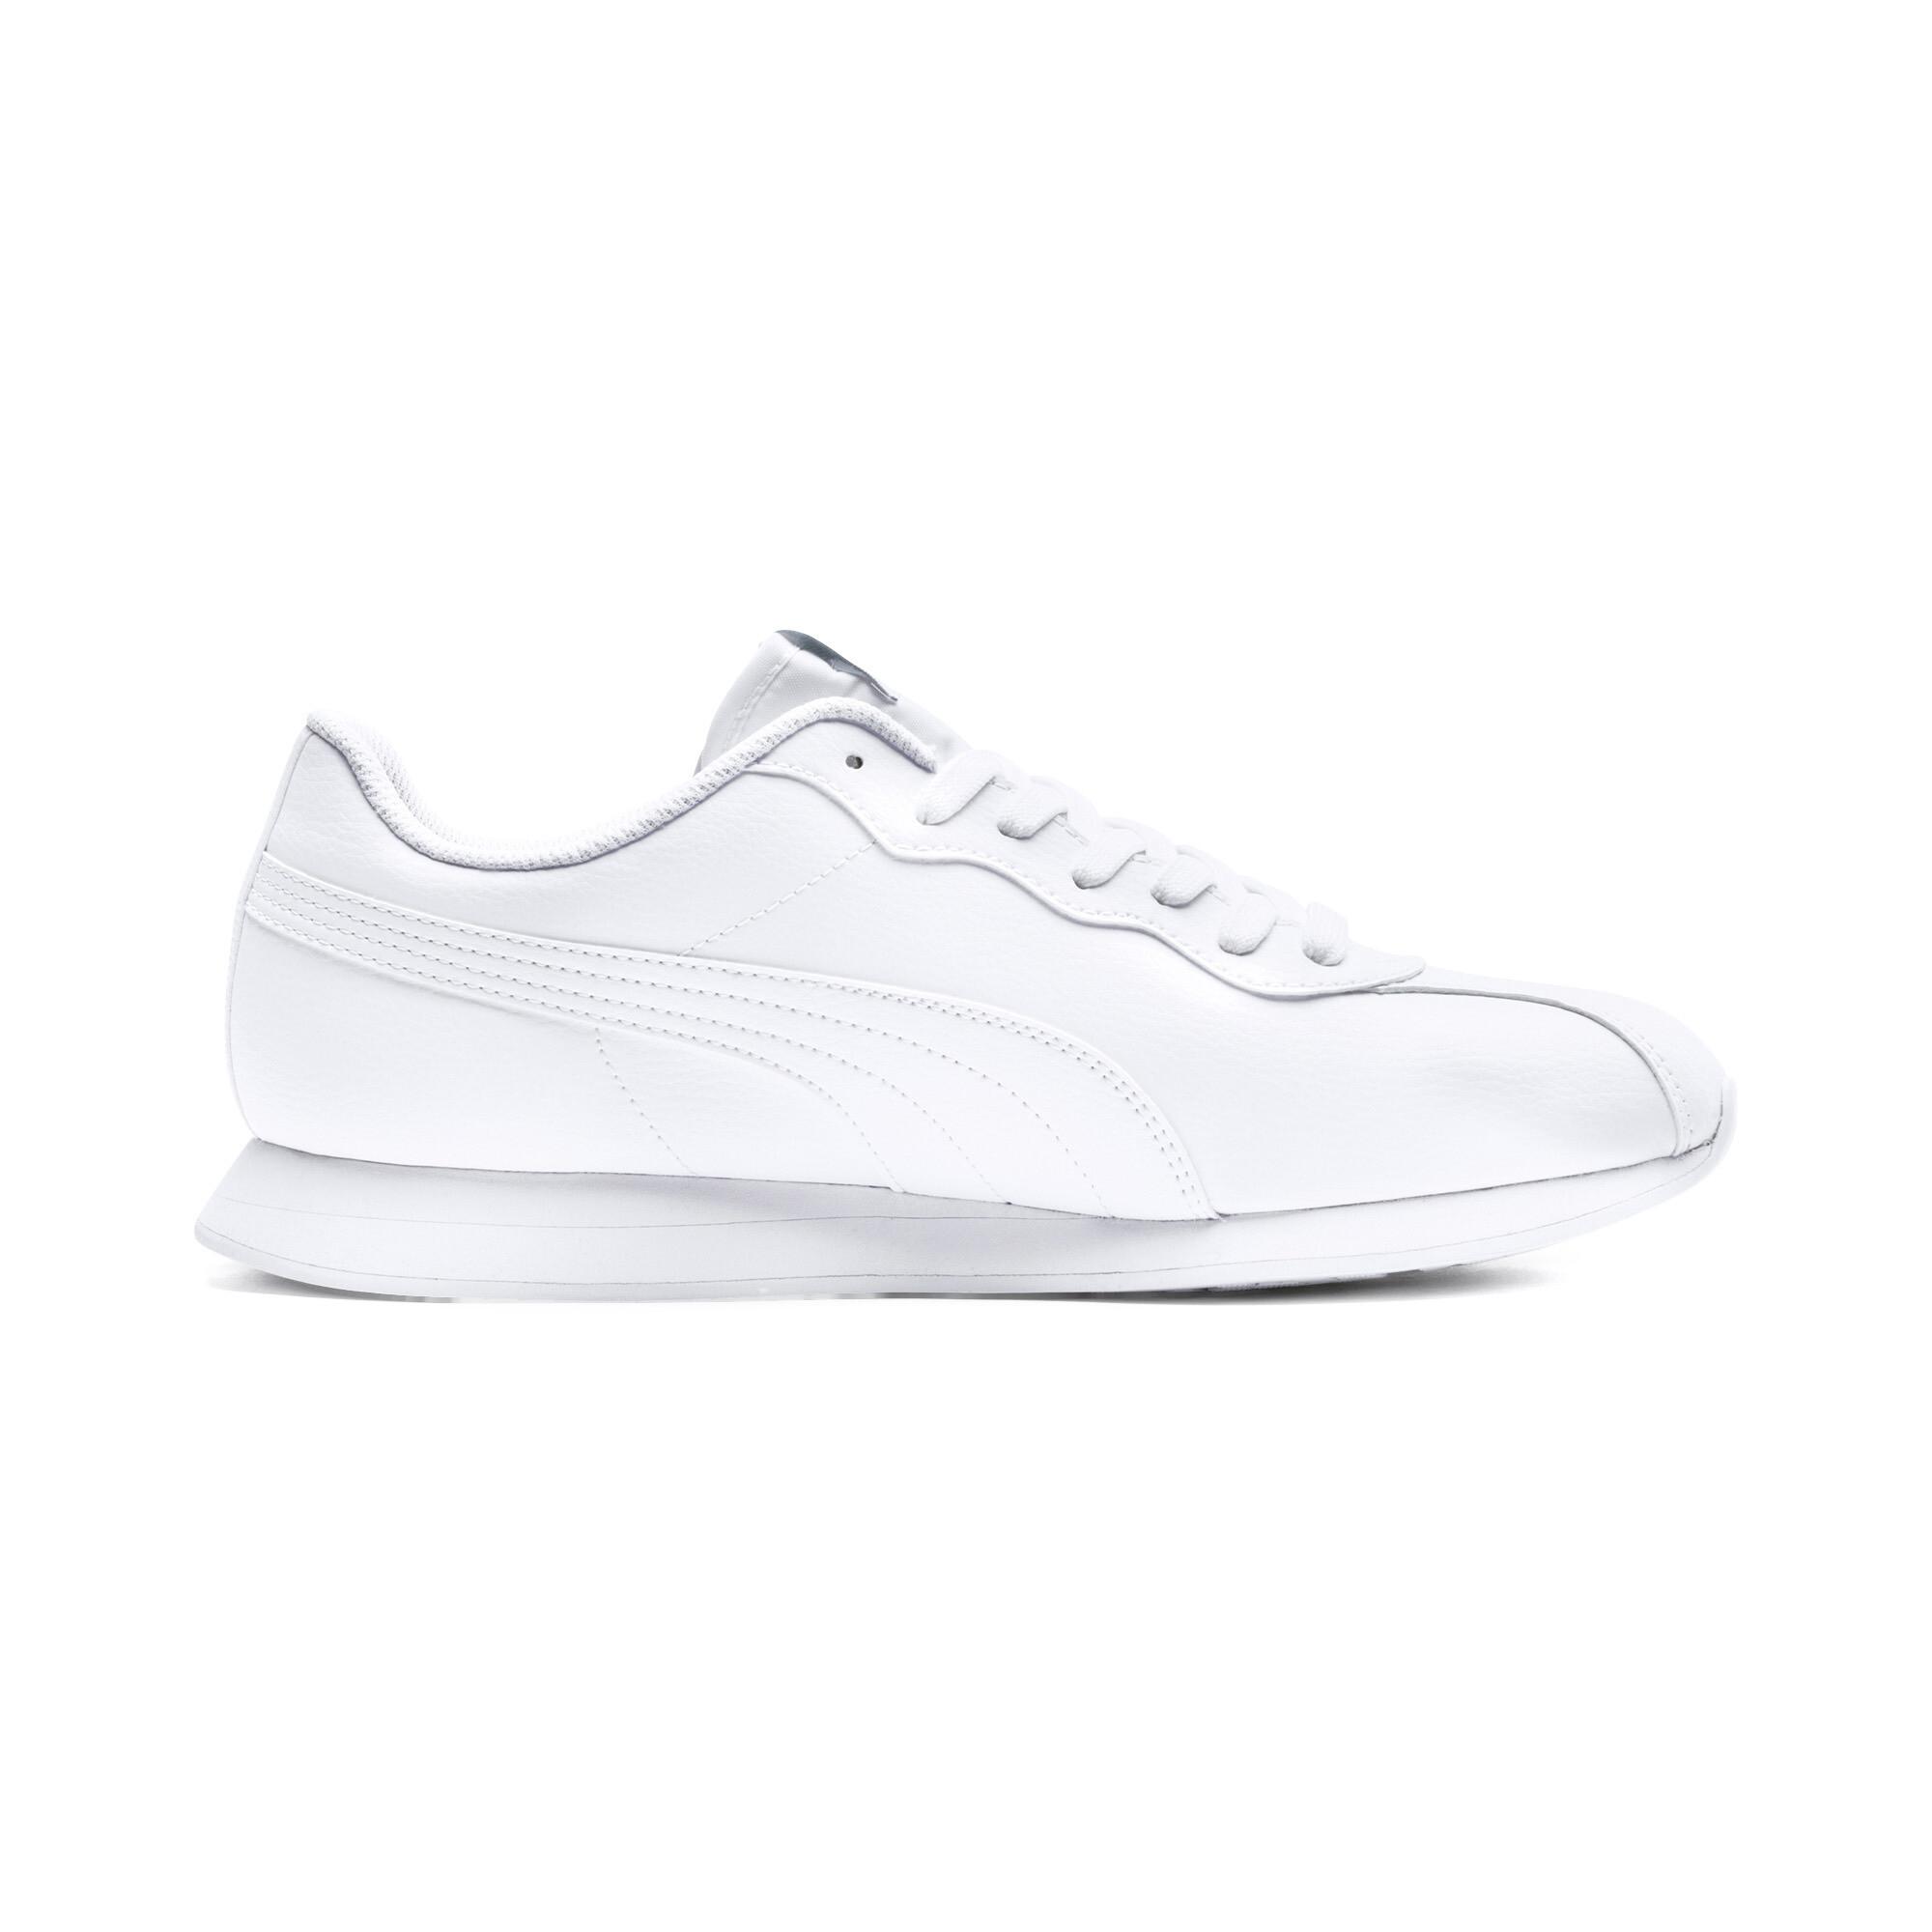 PUMA-Men-039-s-Turin-II-Sneakers thumbnail 12